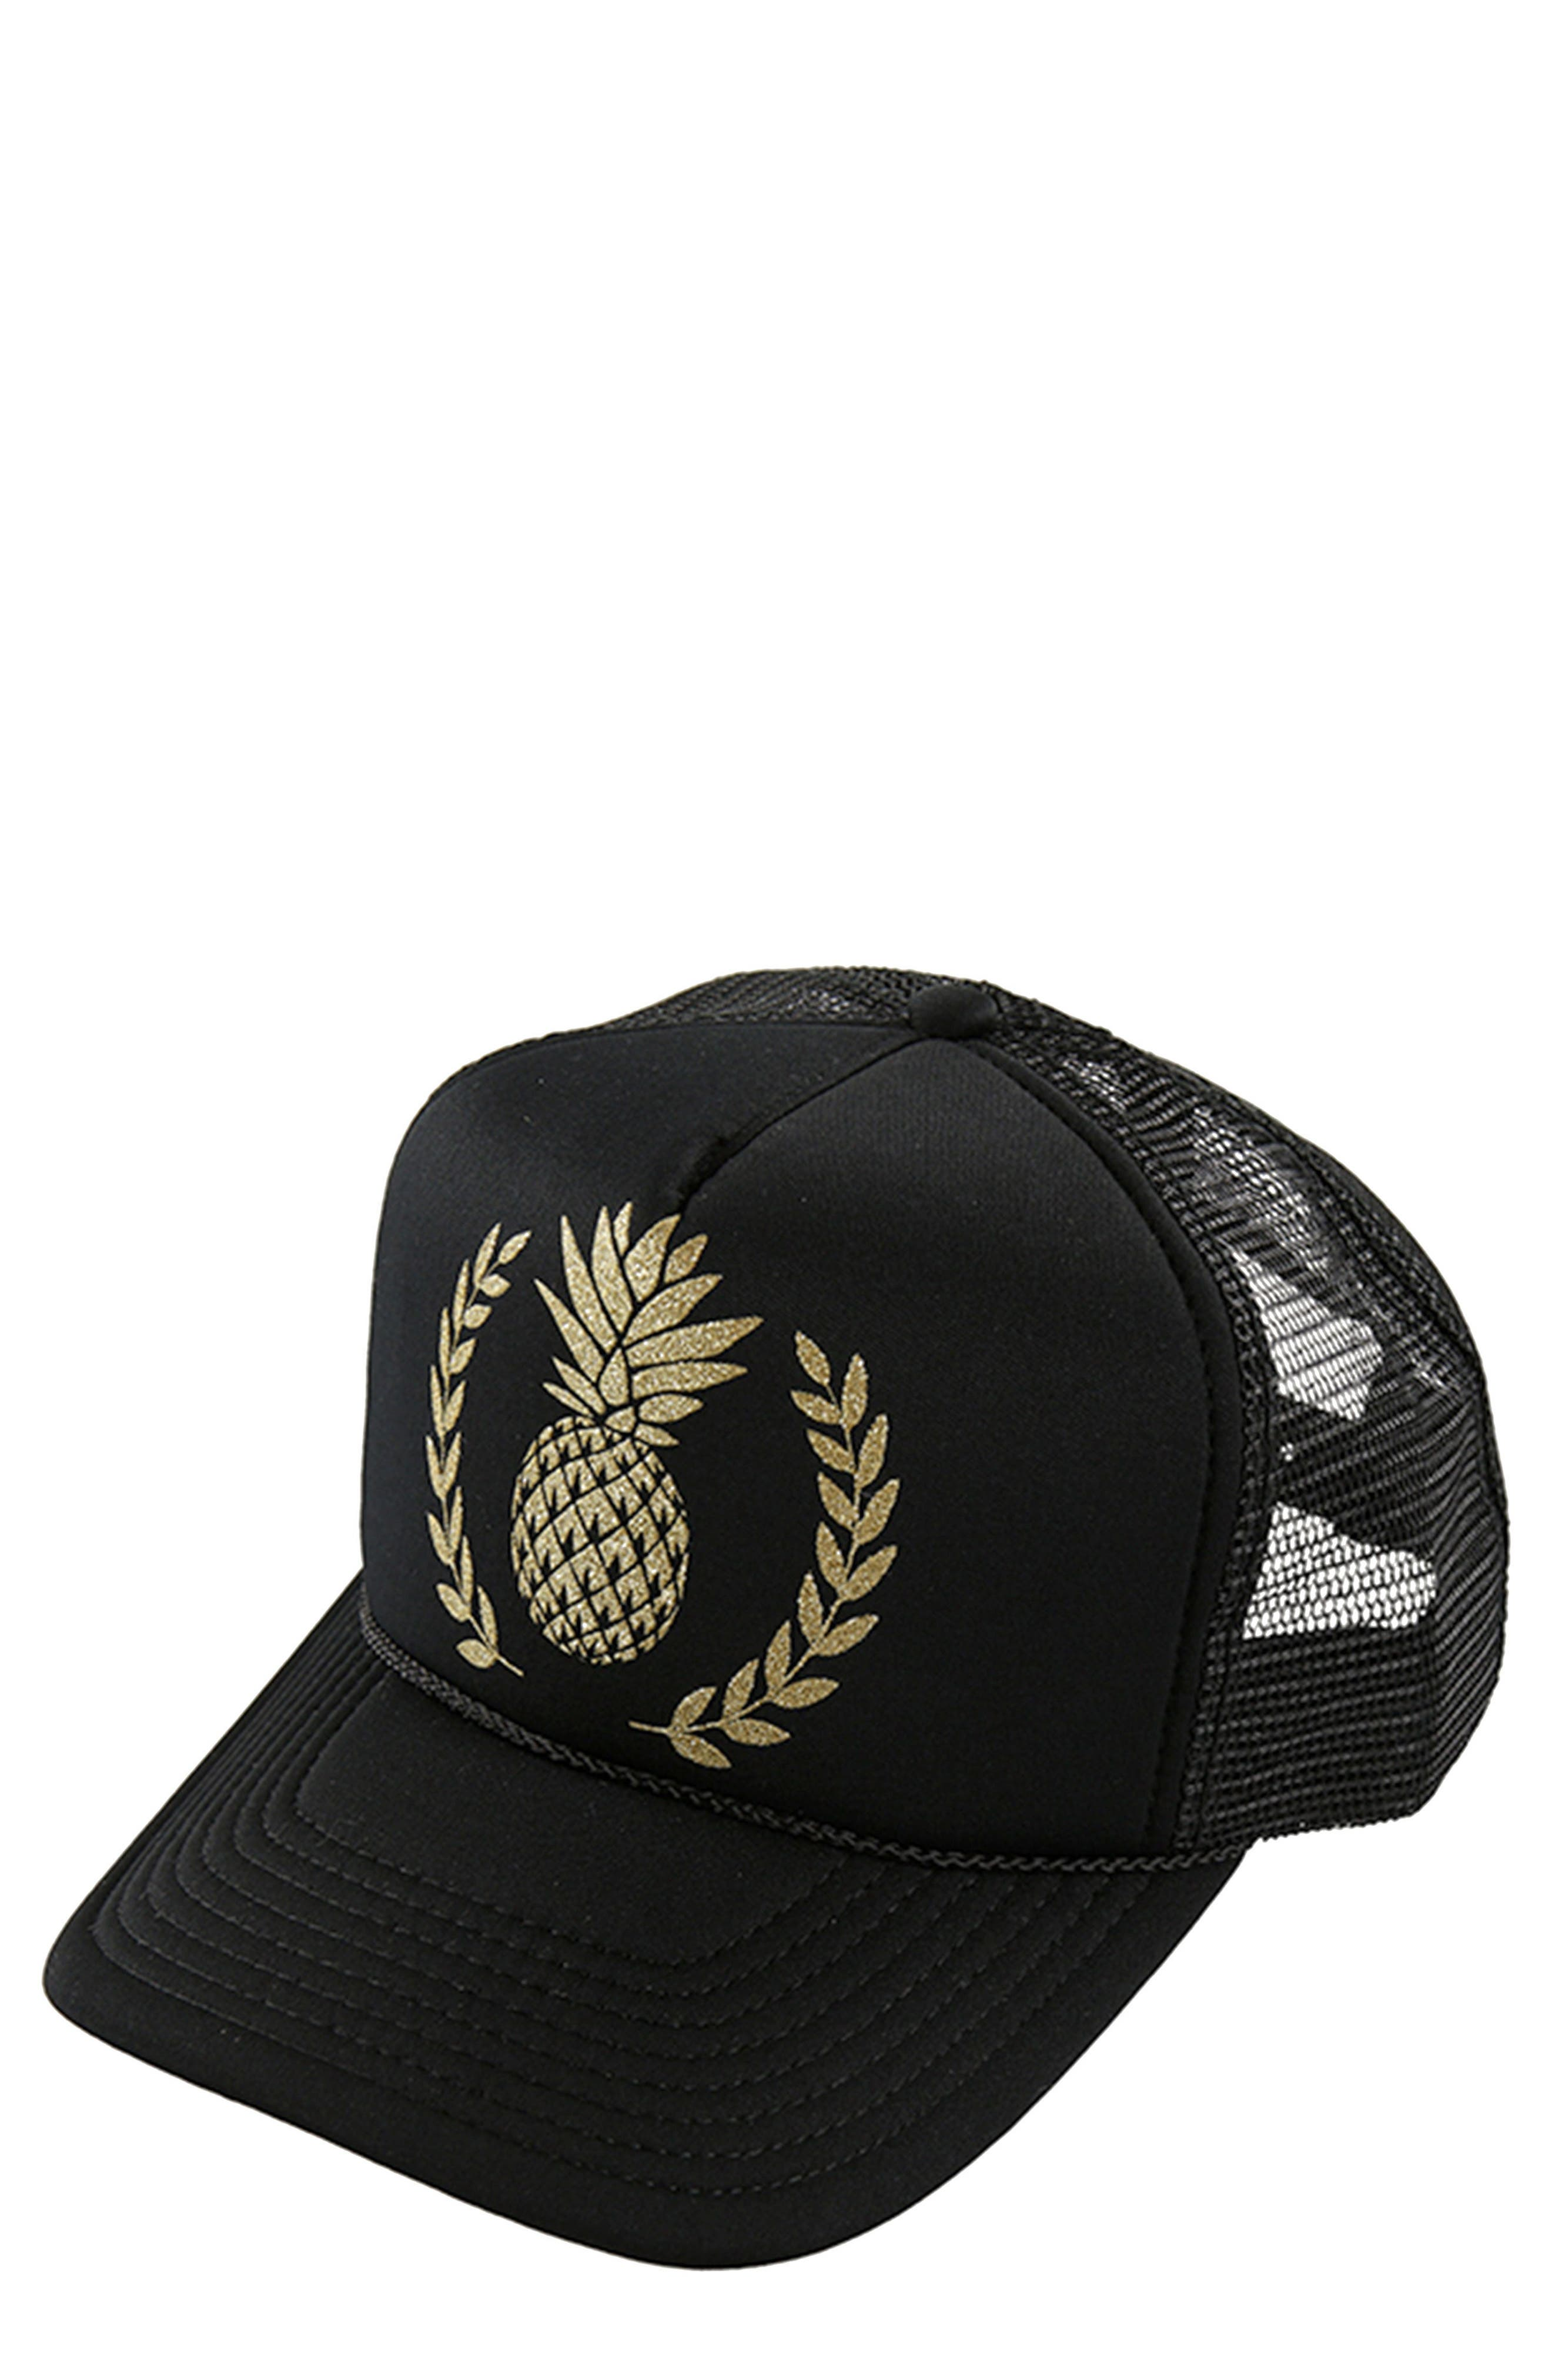 Main Image - O'Neill Sunshine Pineapple Trucker Hat